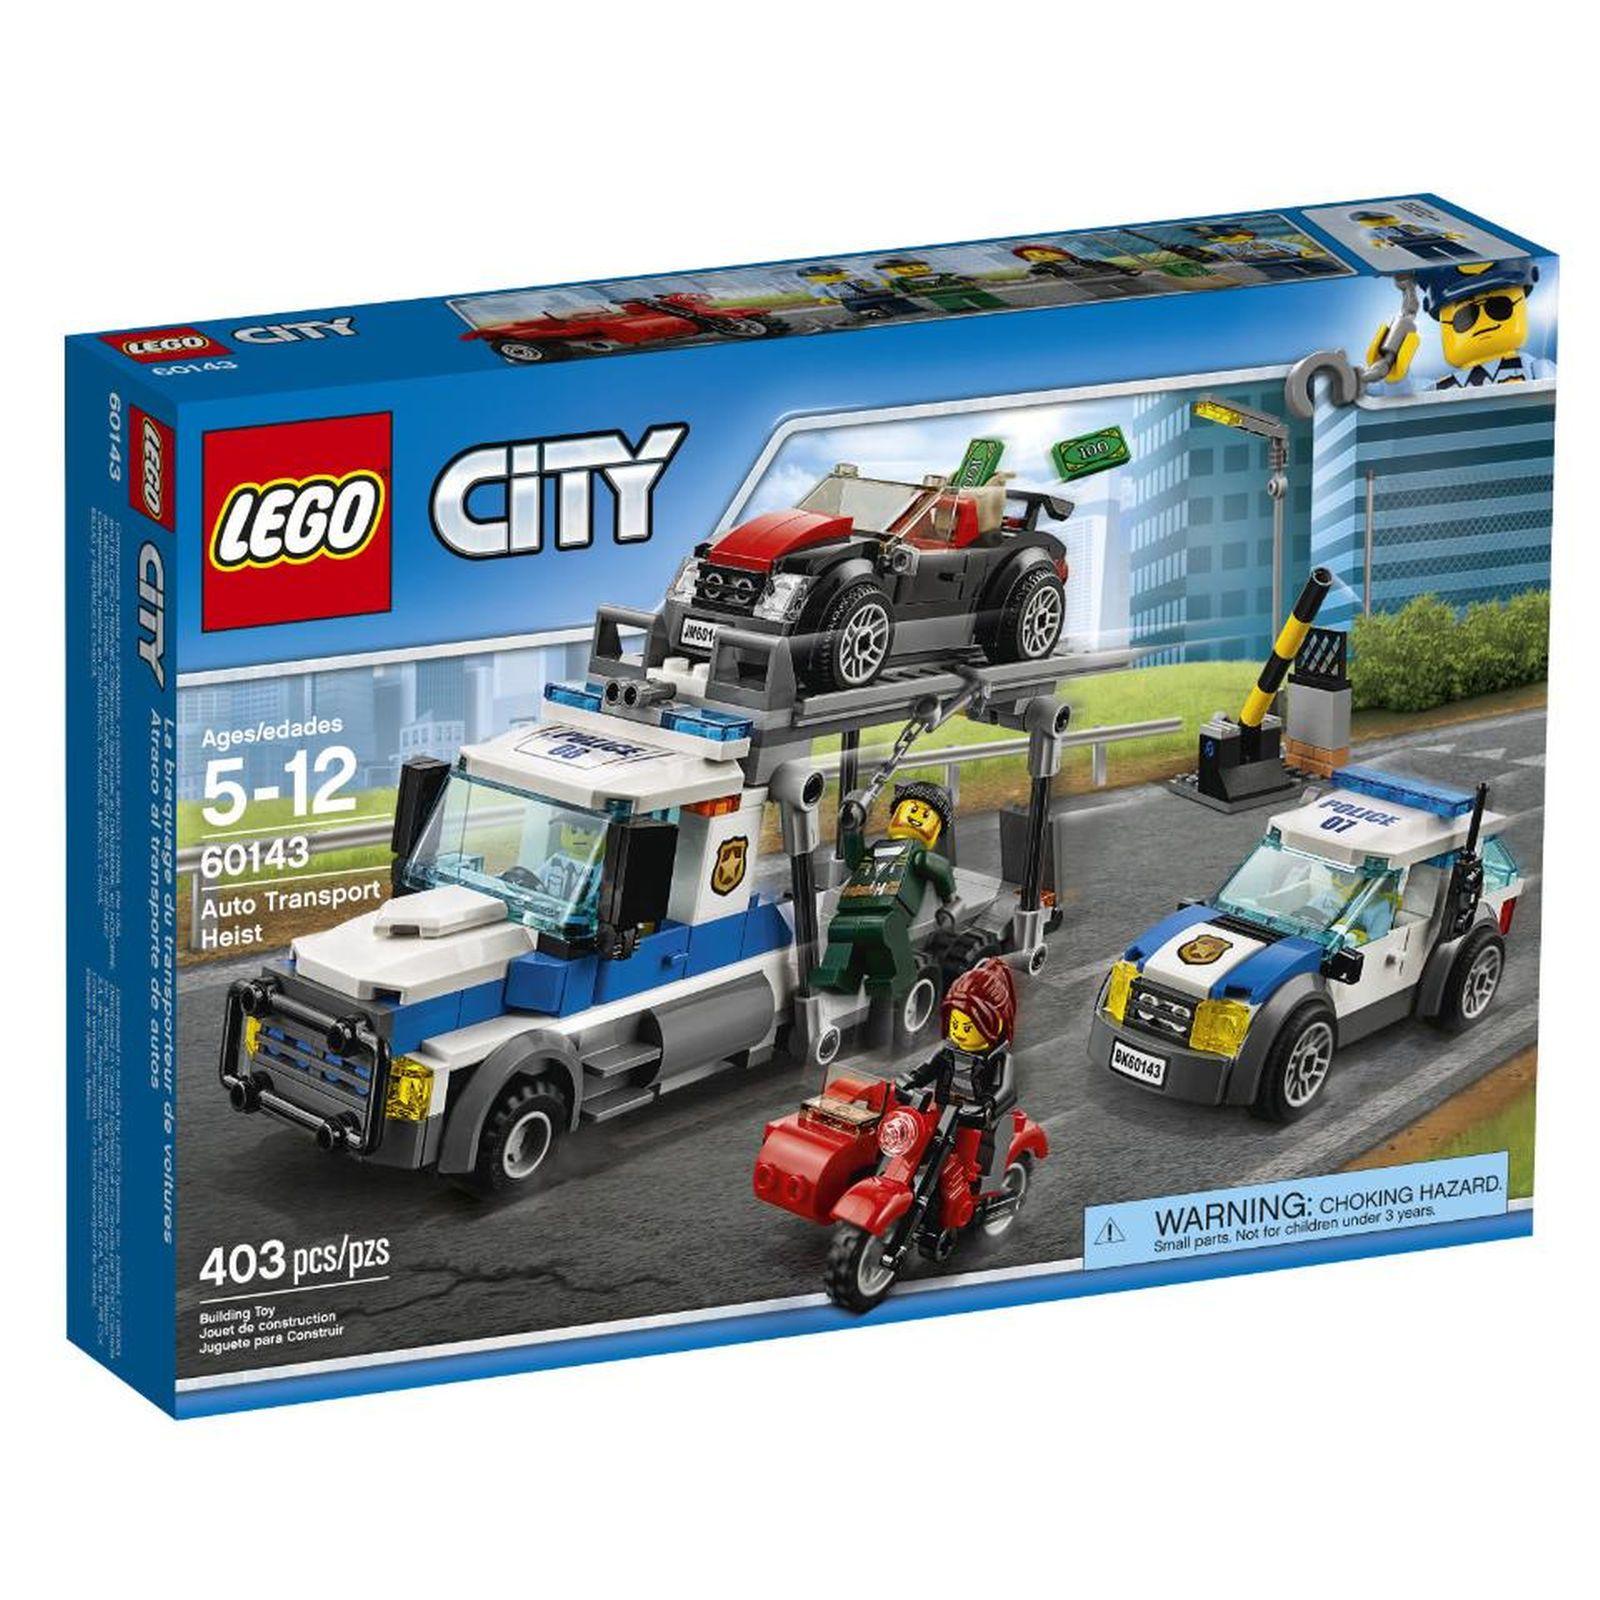 7286 PRISONER TRANSPORT lego city town SEALED police NEW legos set RETIRED